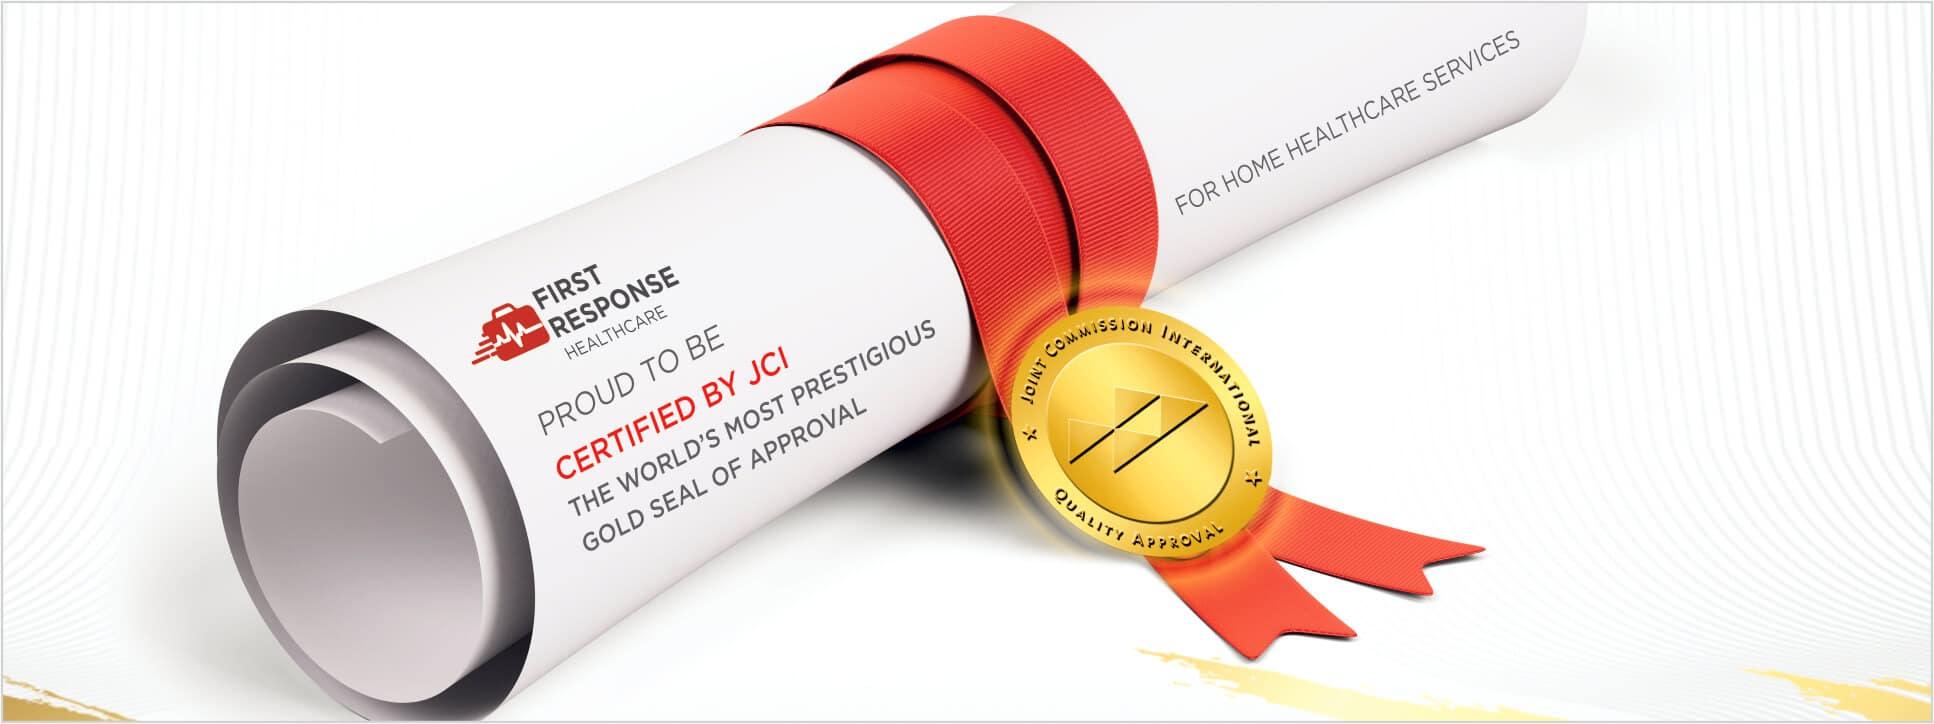 JCI-Accreditation-Home-Care-Dubai